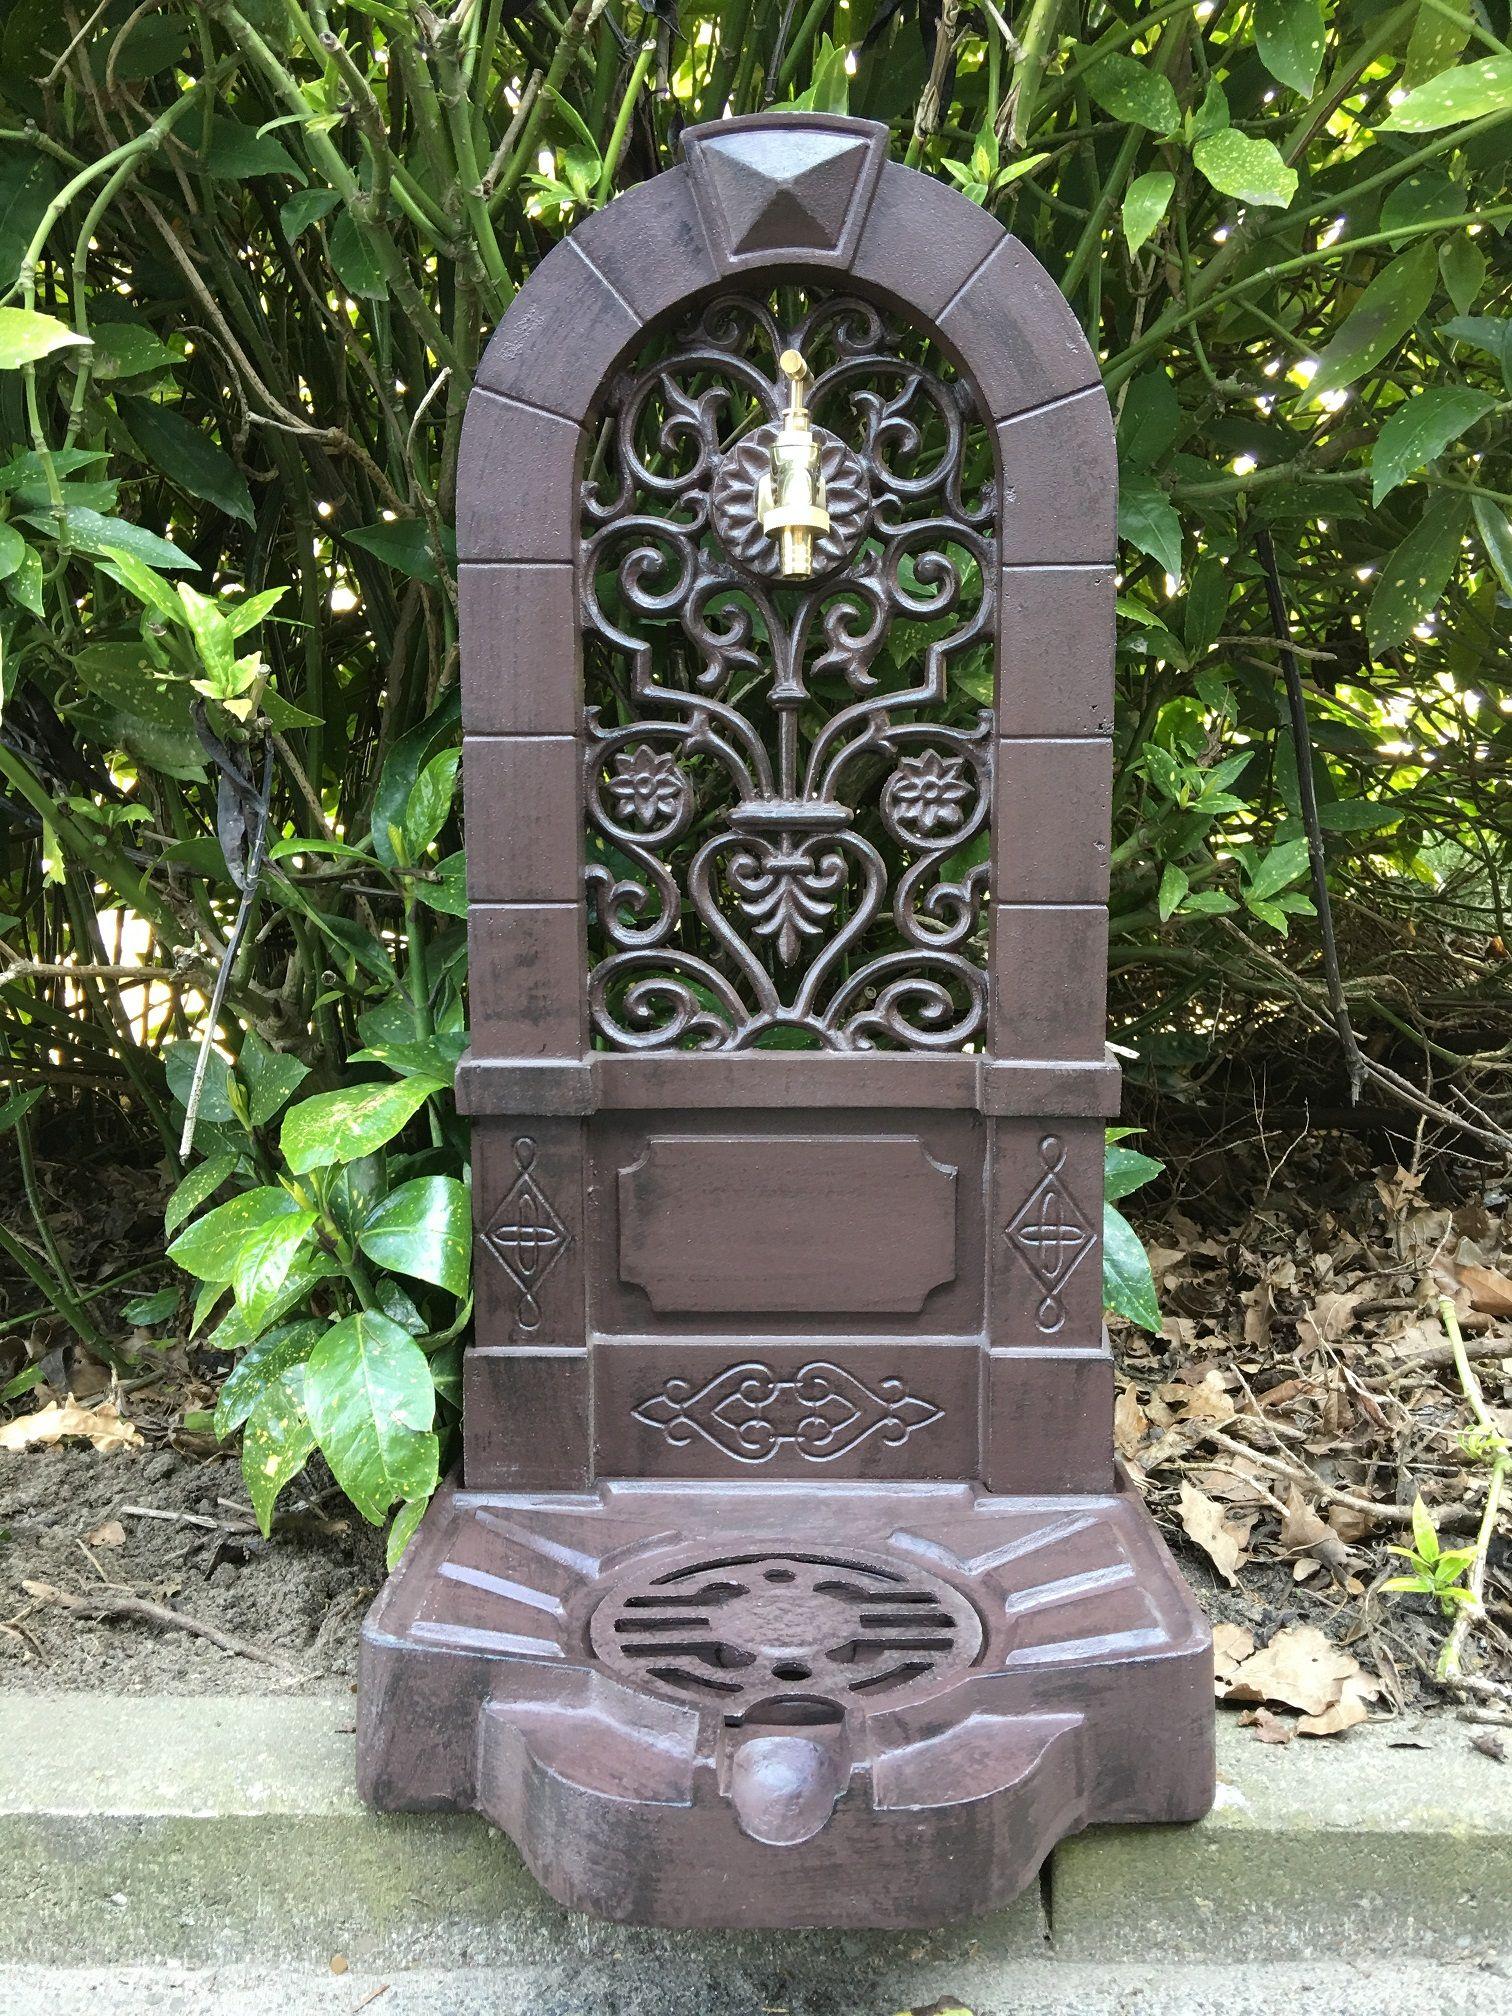 tags  tuin, fonteinen, muur fonteinen, rond de eeuwwisseling, in landelijke stijl, art nouveau